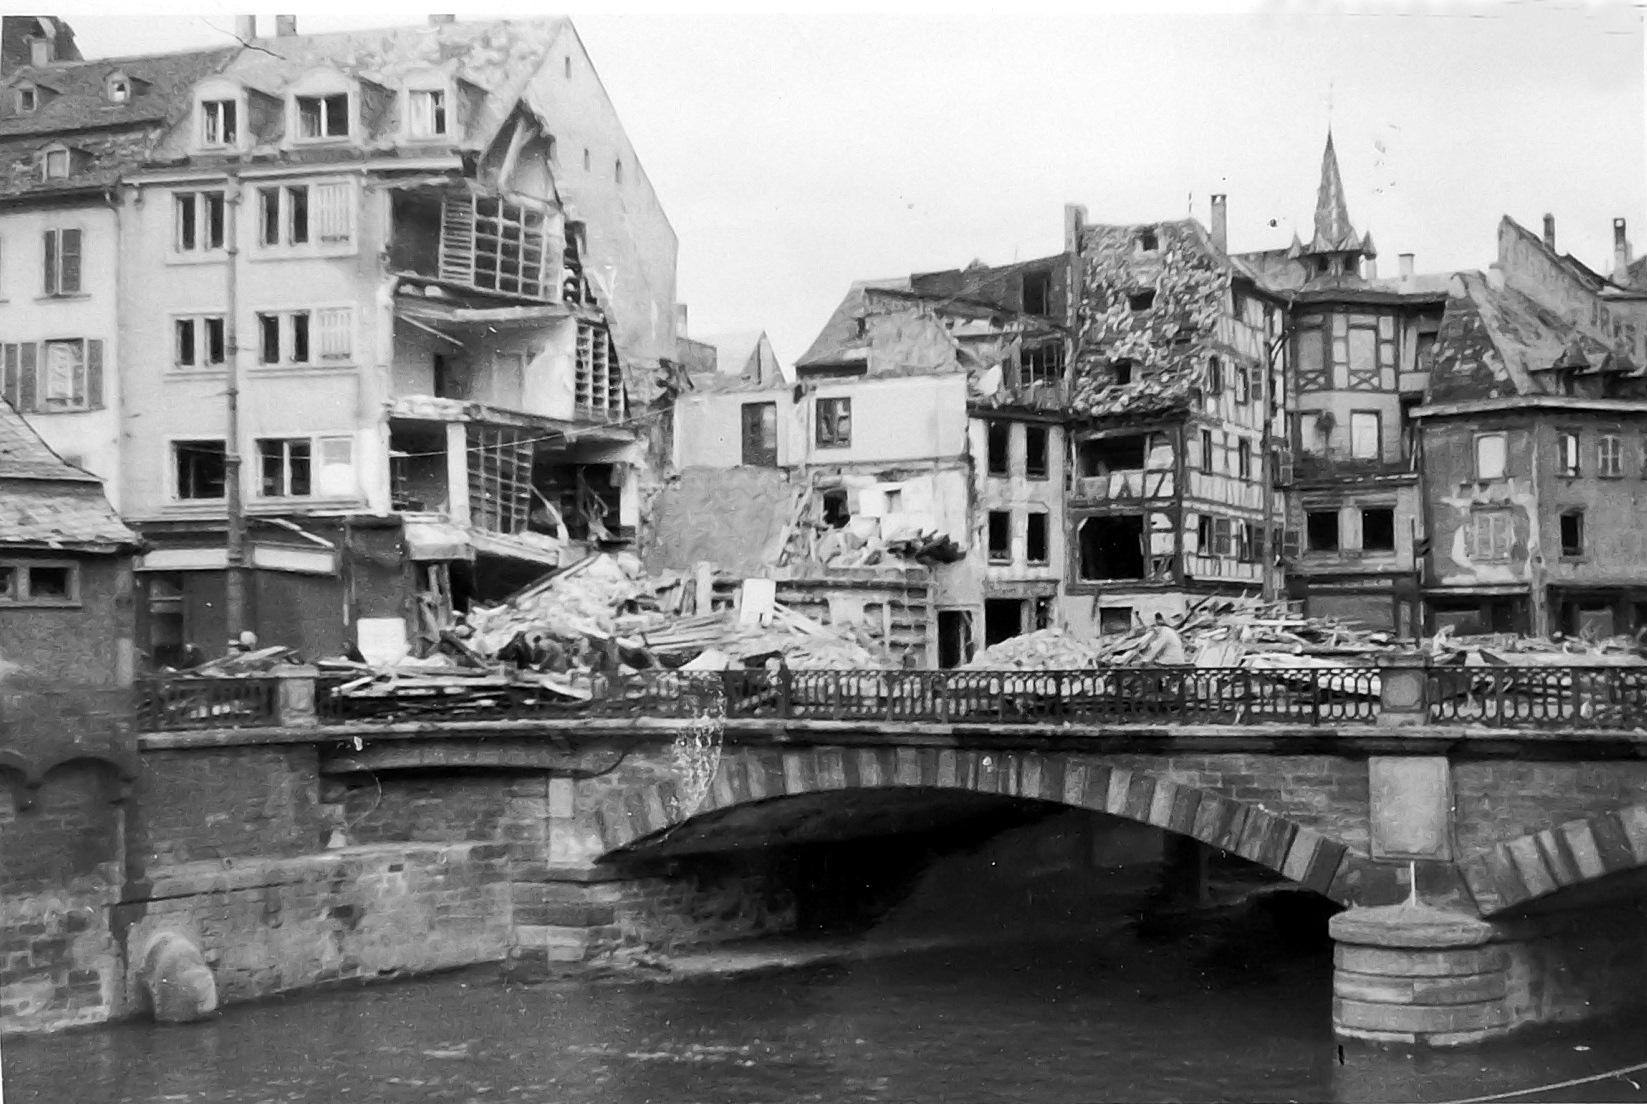 Faubourg National 4 1 Fi 115 159 sept 1944